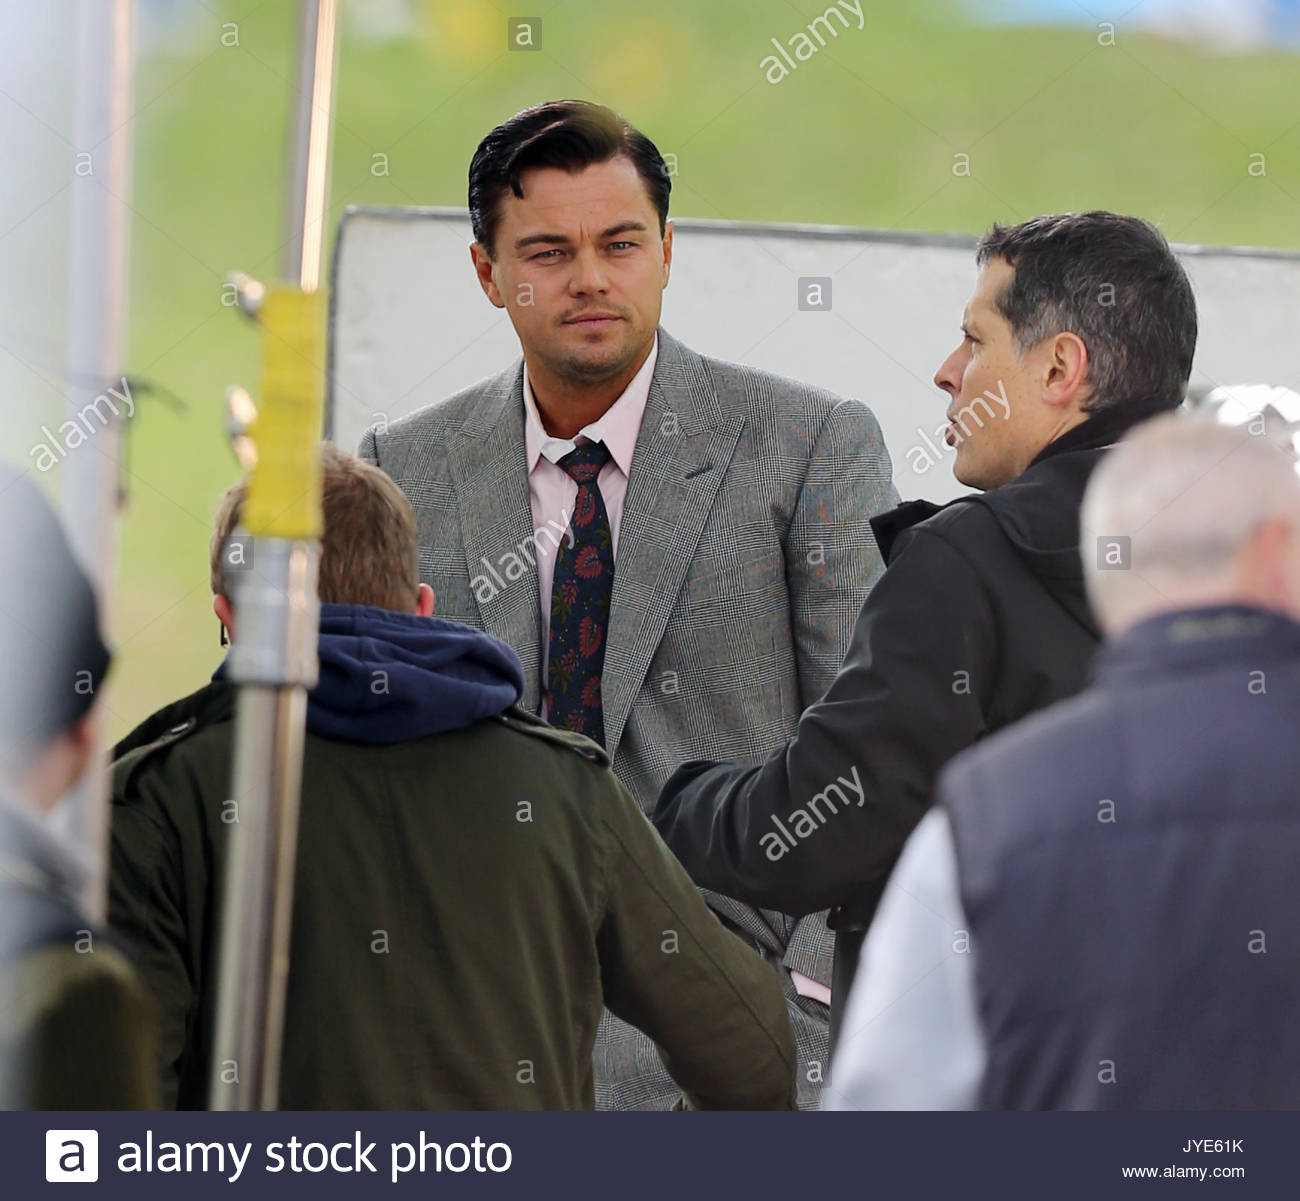 e105e16b8d4 Leonardo DiCaprio. Leonardo DiCaprio shoots further scenes for the Scorsese  directed film  Wolf of Wall Street  in Prospect Park